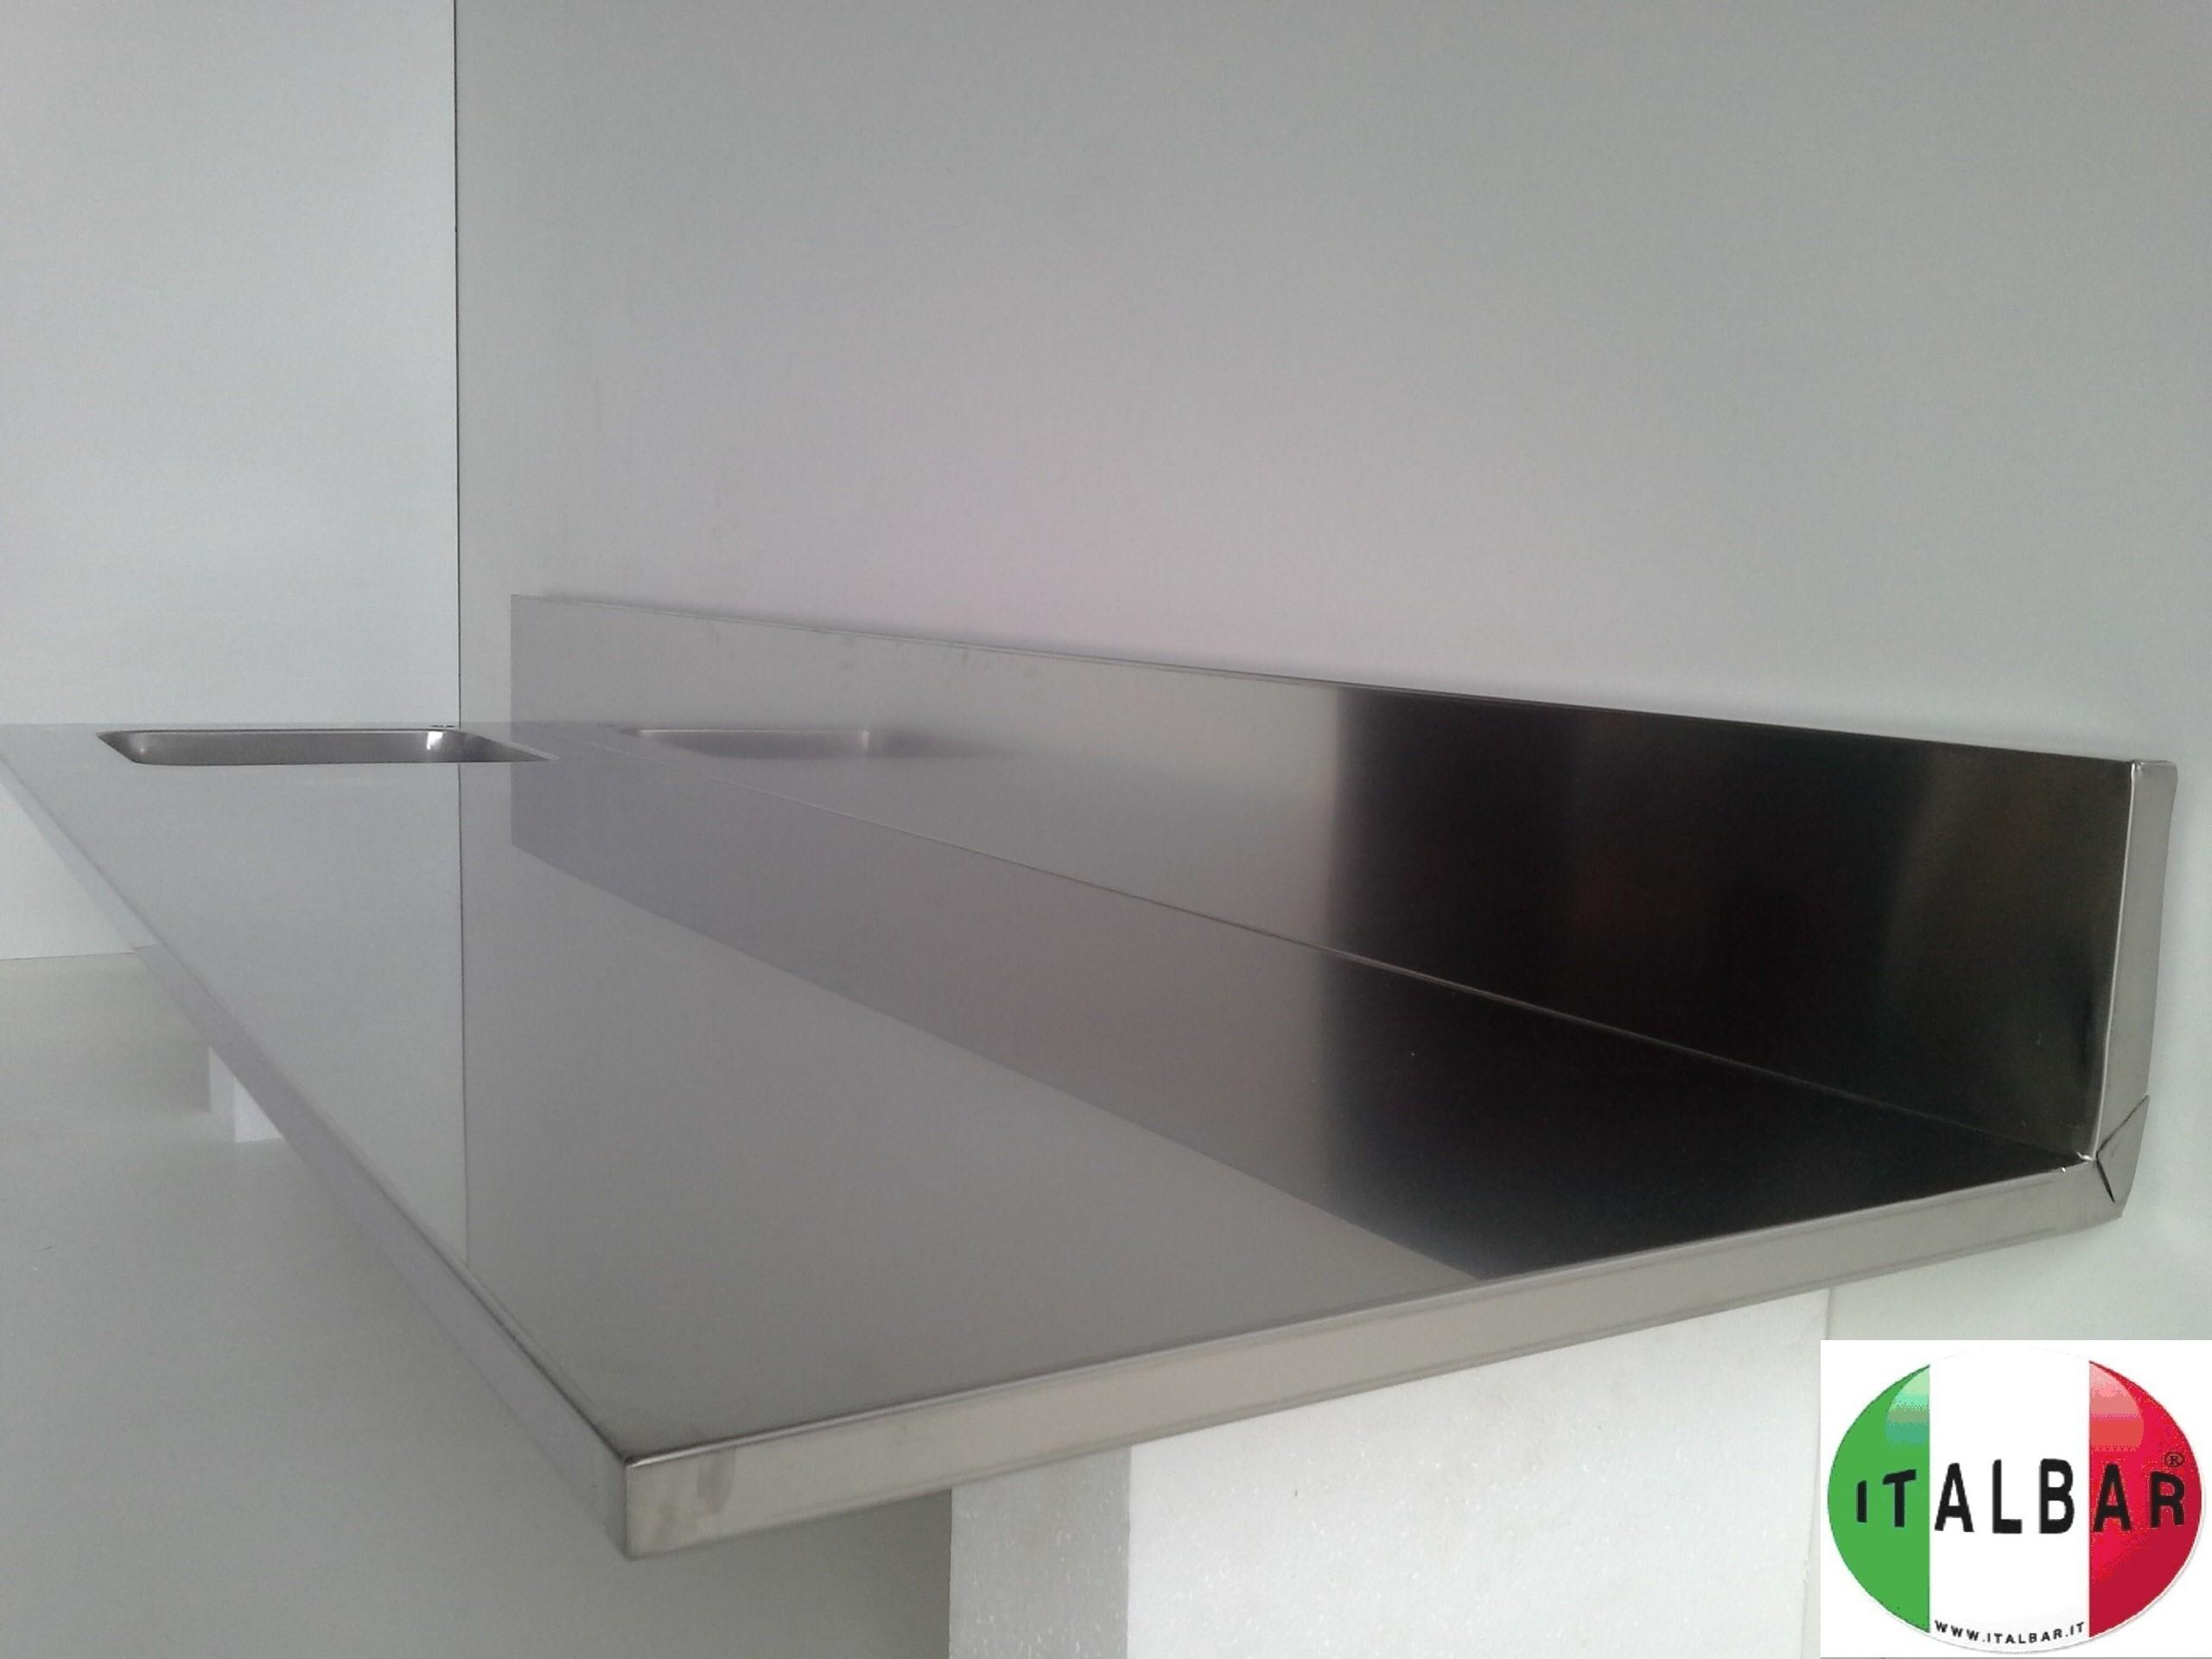 Italbar Banconi Bar Banchi Frigo Vetrine Refrigerate Sokolvineyard Com